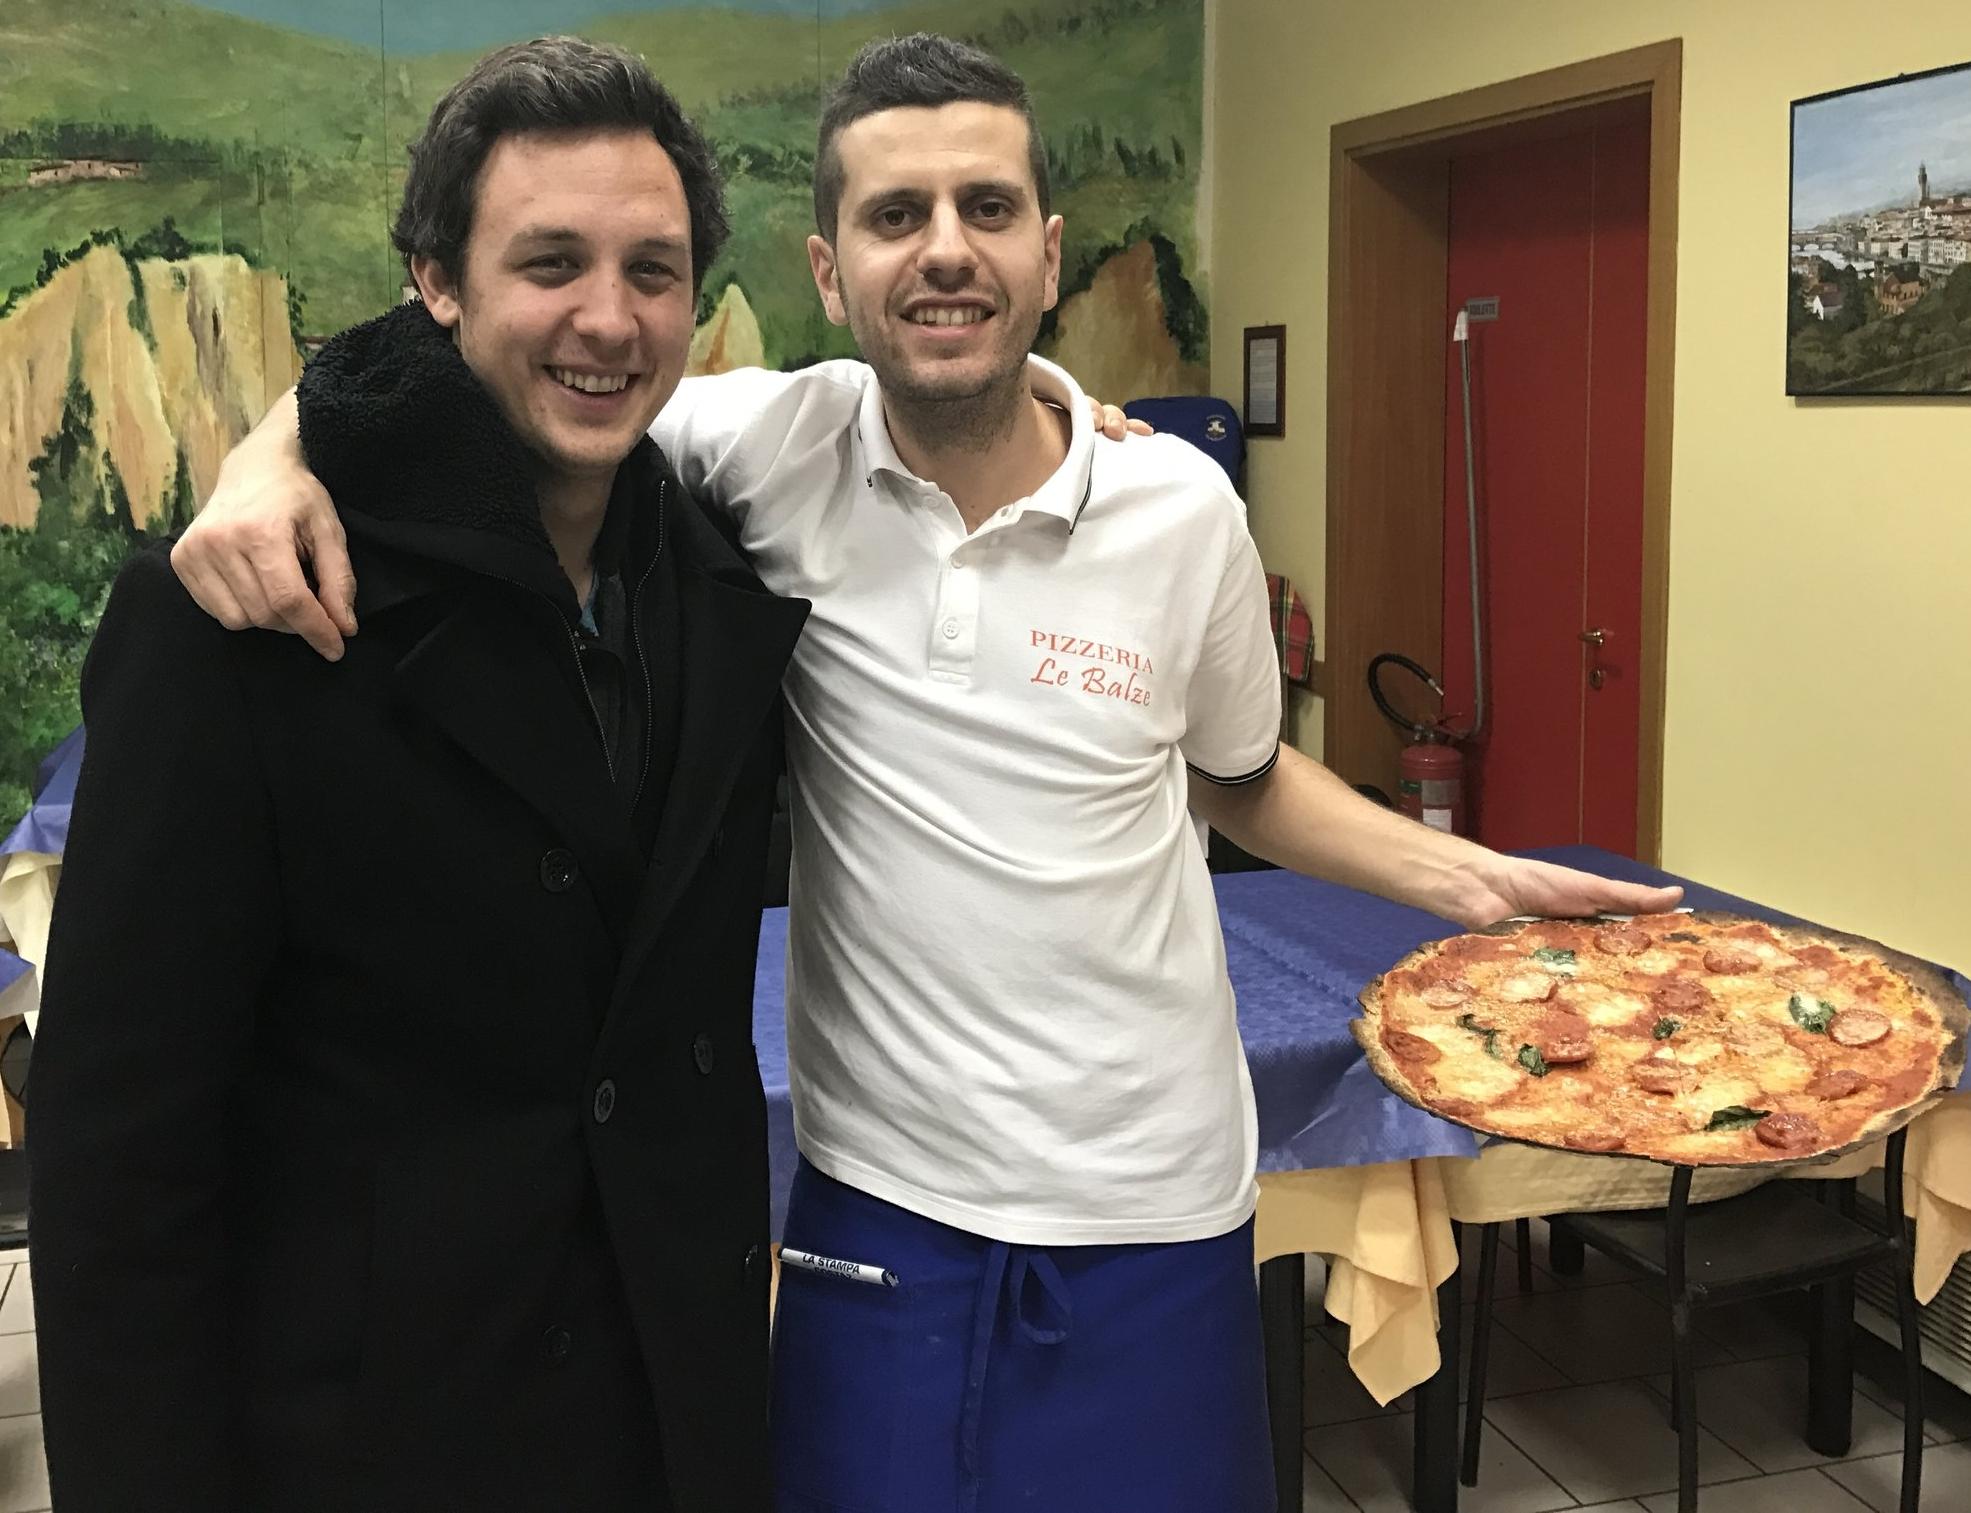 Experience Italy: A True Italian Experience With My Friend Fabio